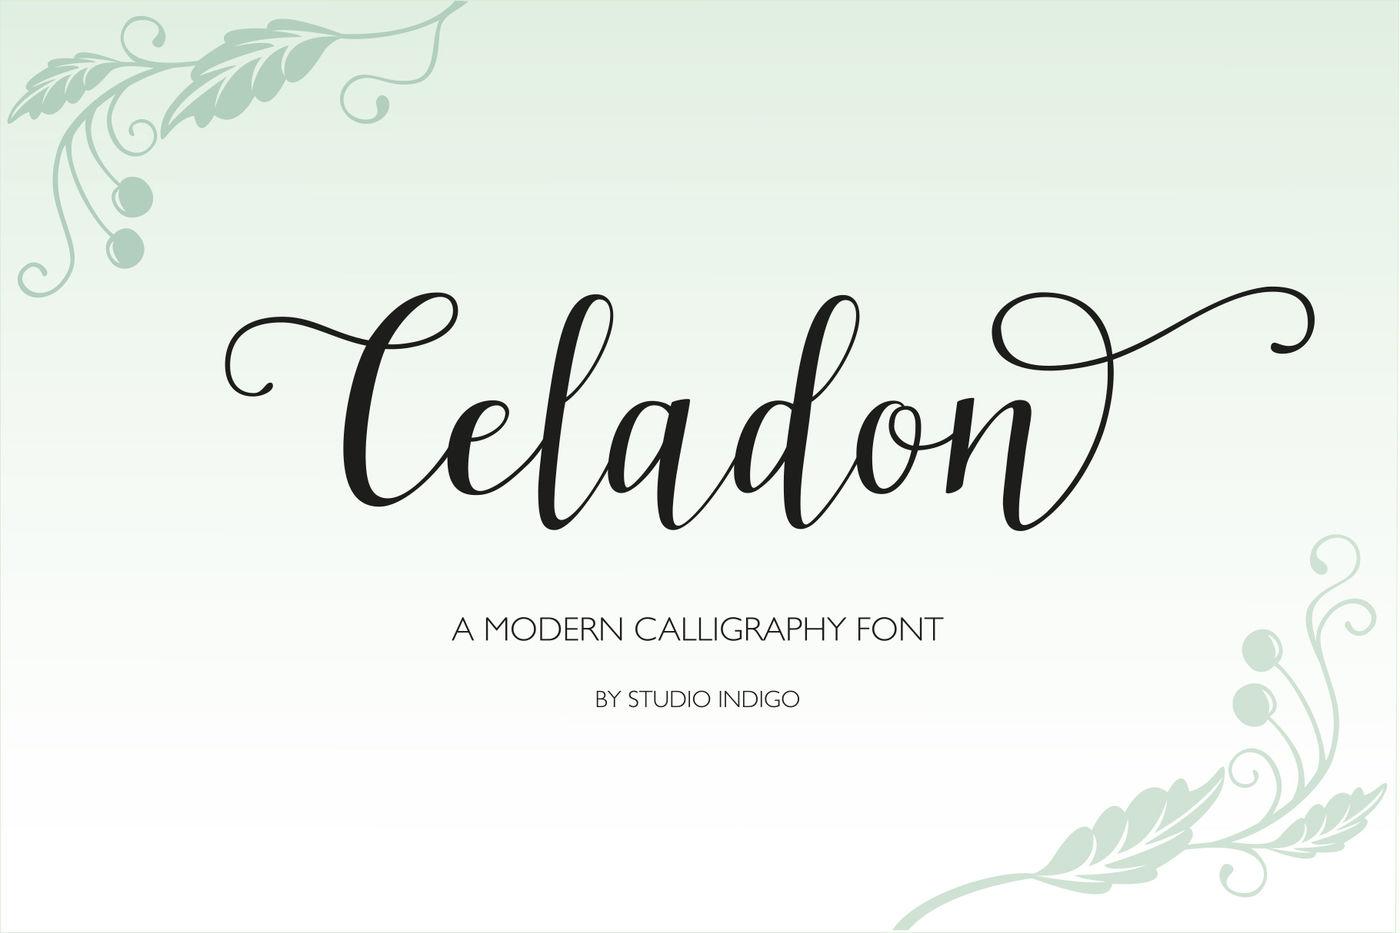 Celadon Modern Calligraphy Font By Studio Indigo Thehungryjpeg Com